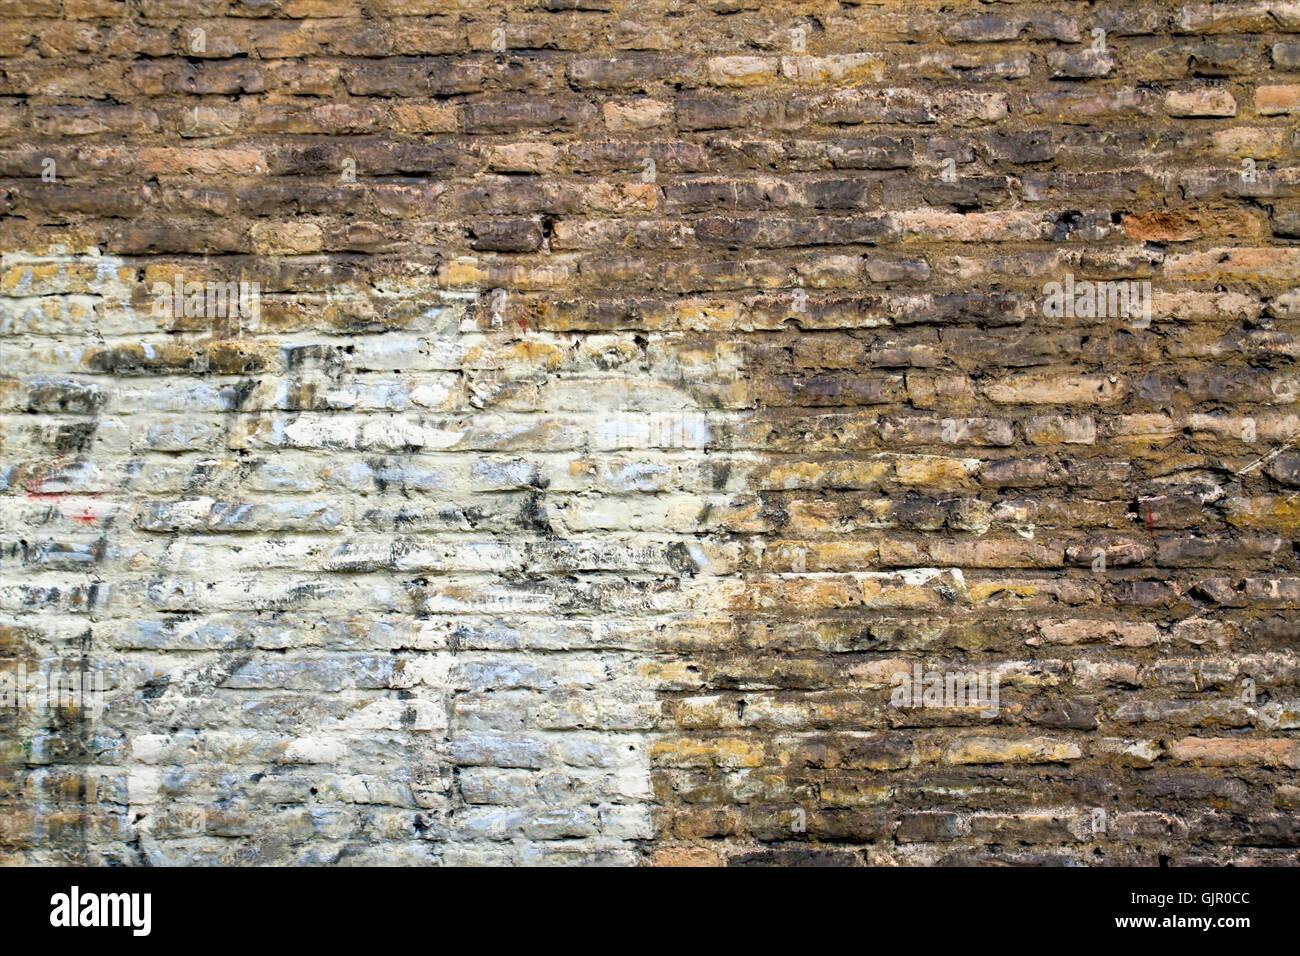 Brick Wall Old Ruined Plaster Stock Photos Amp Brick Wall